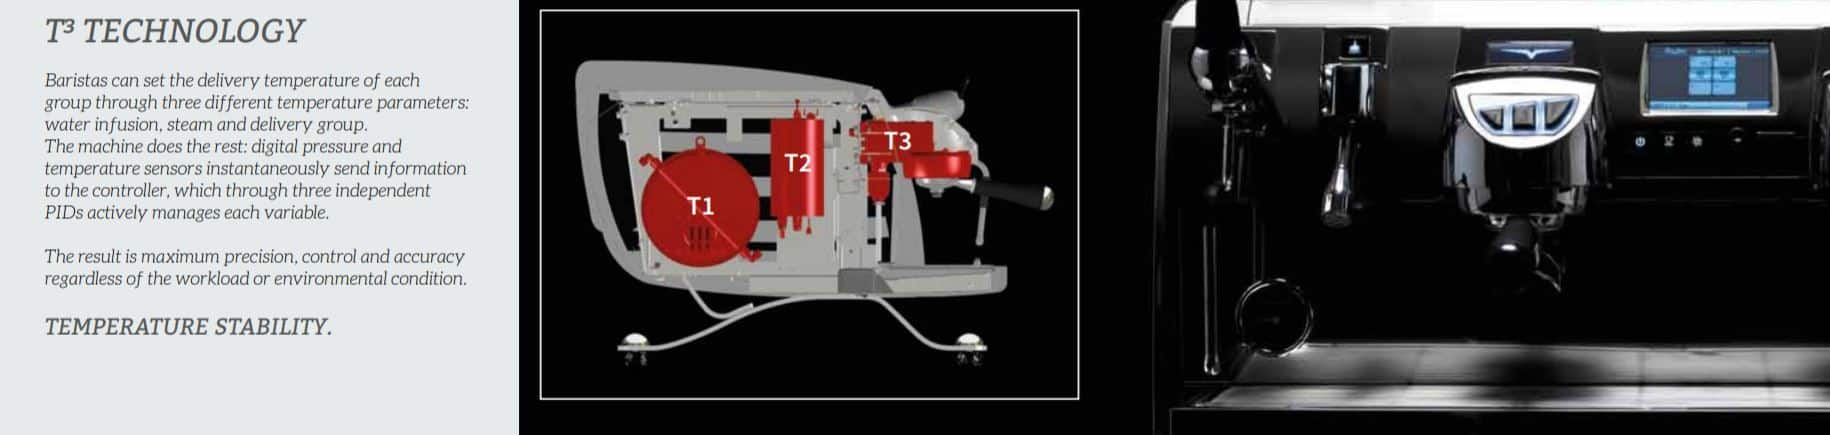 t3 espresso machine technology